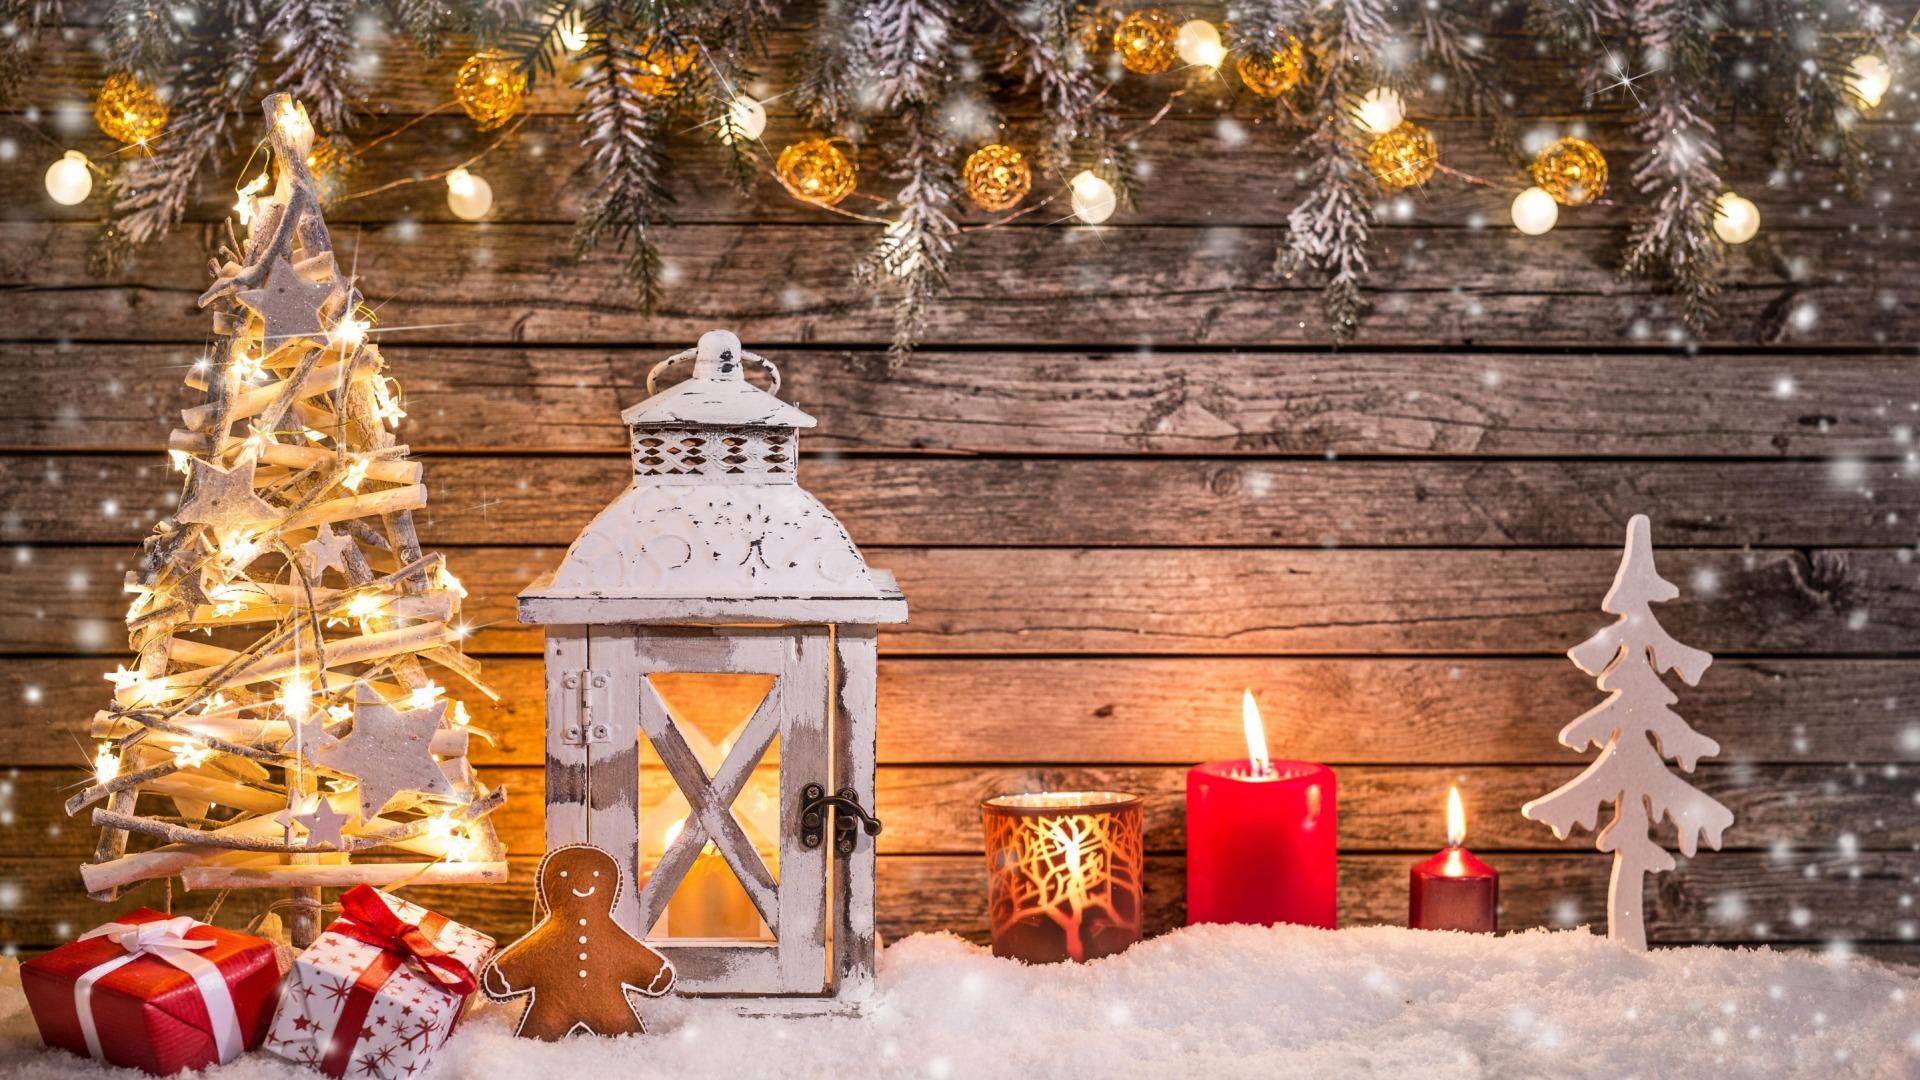 Merry Christmas Wallpaper 5 Christmas Holidays Changewallpaper